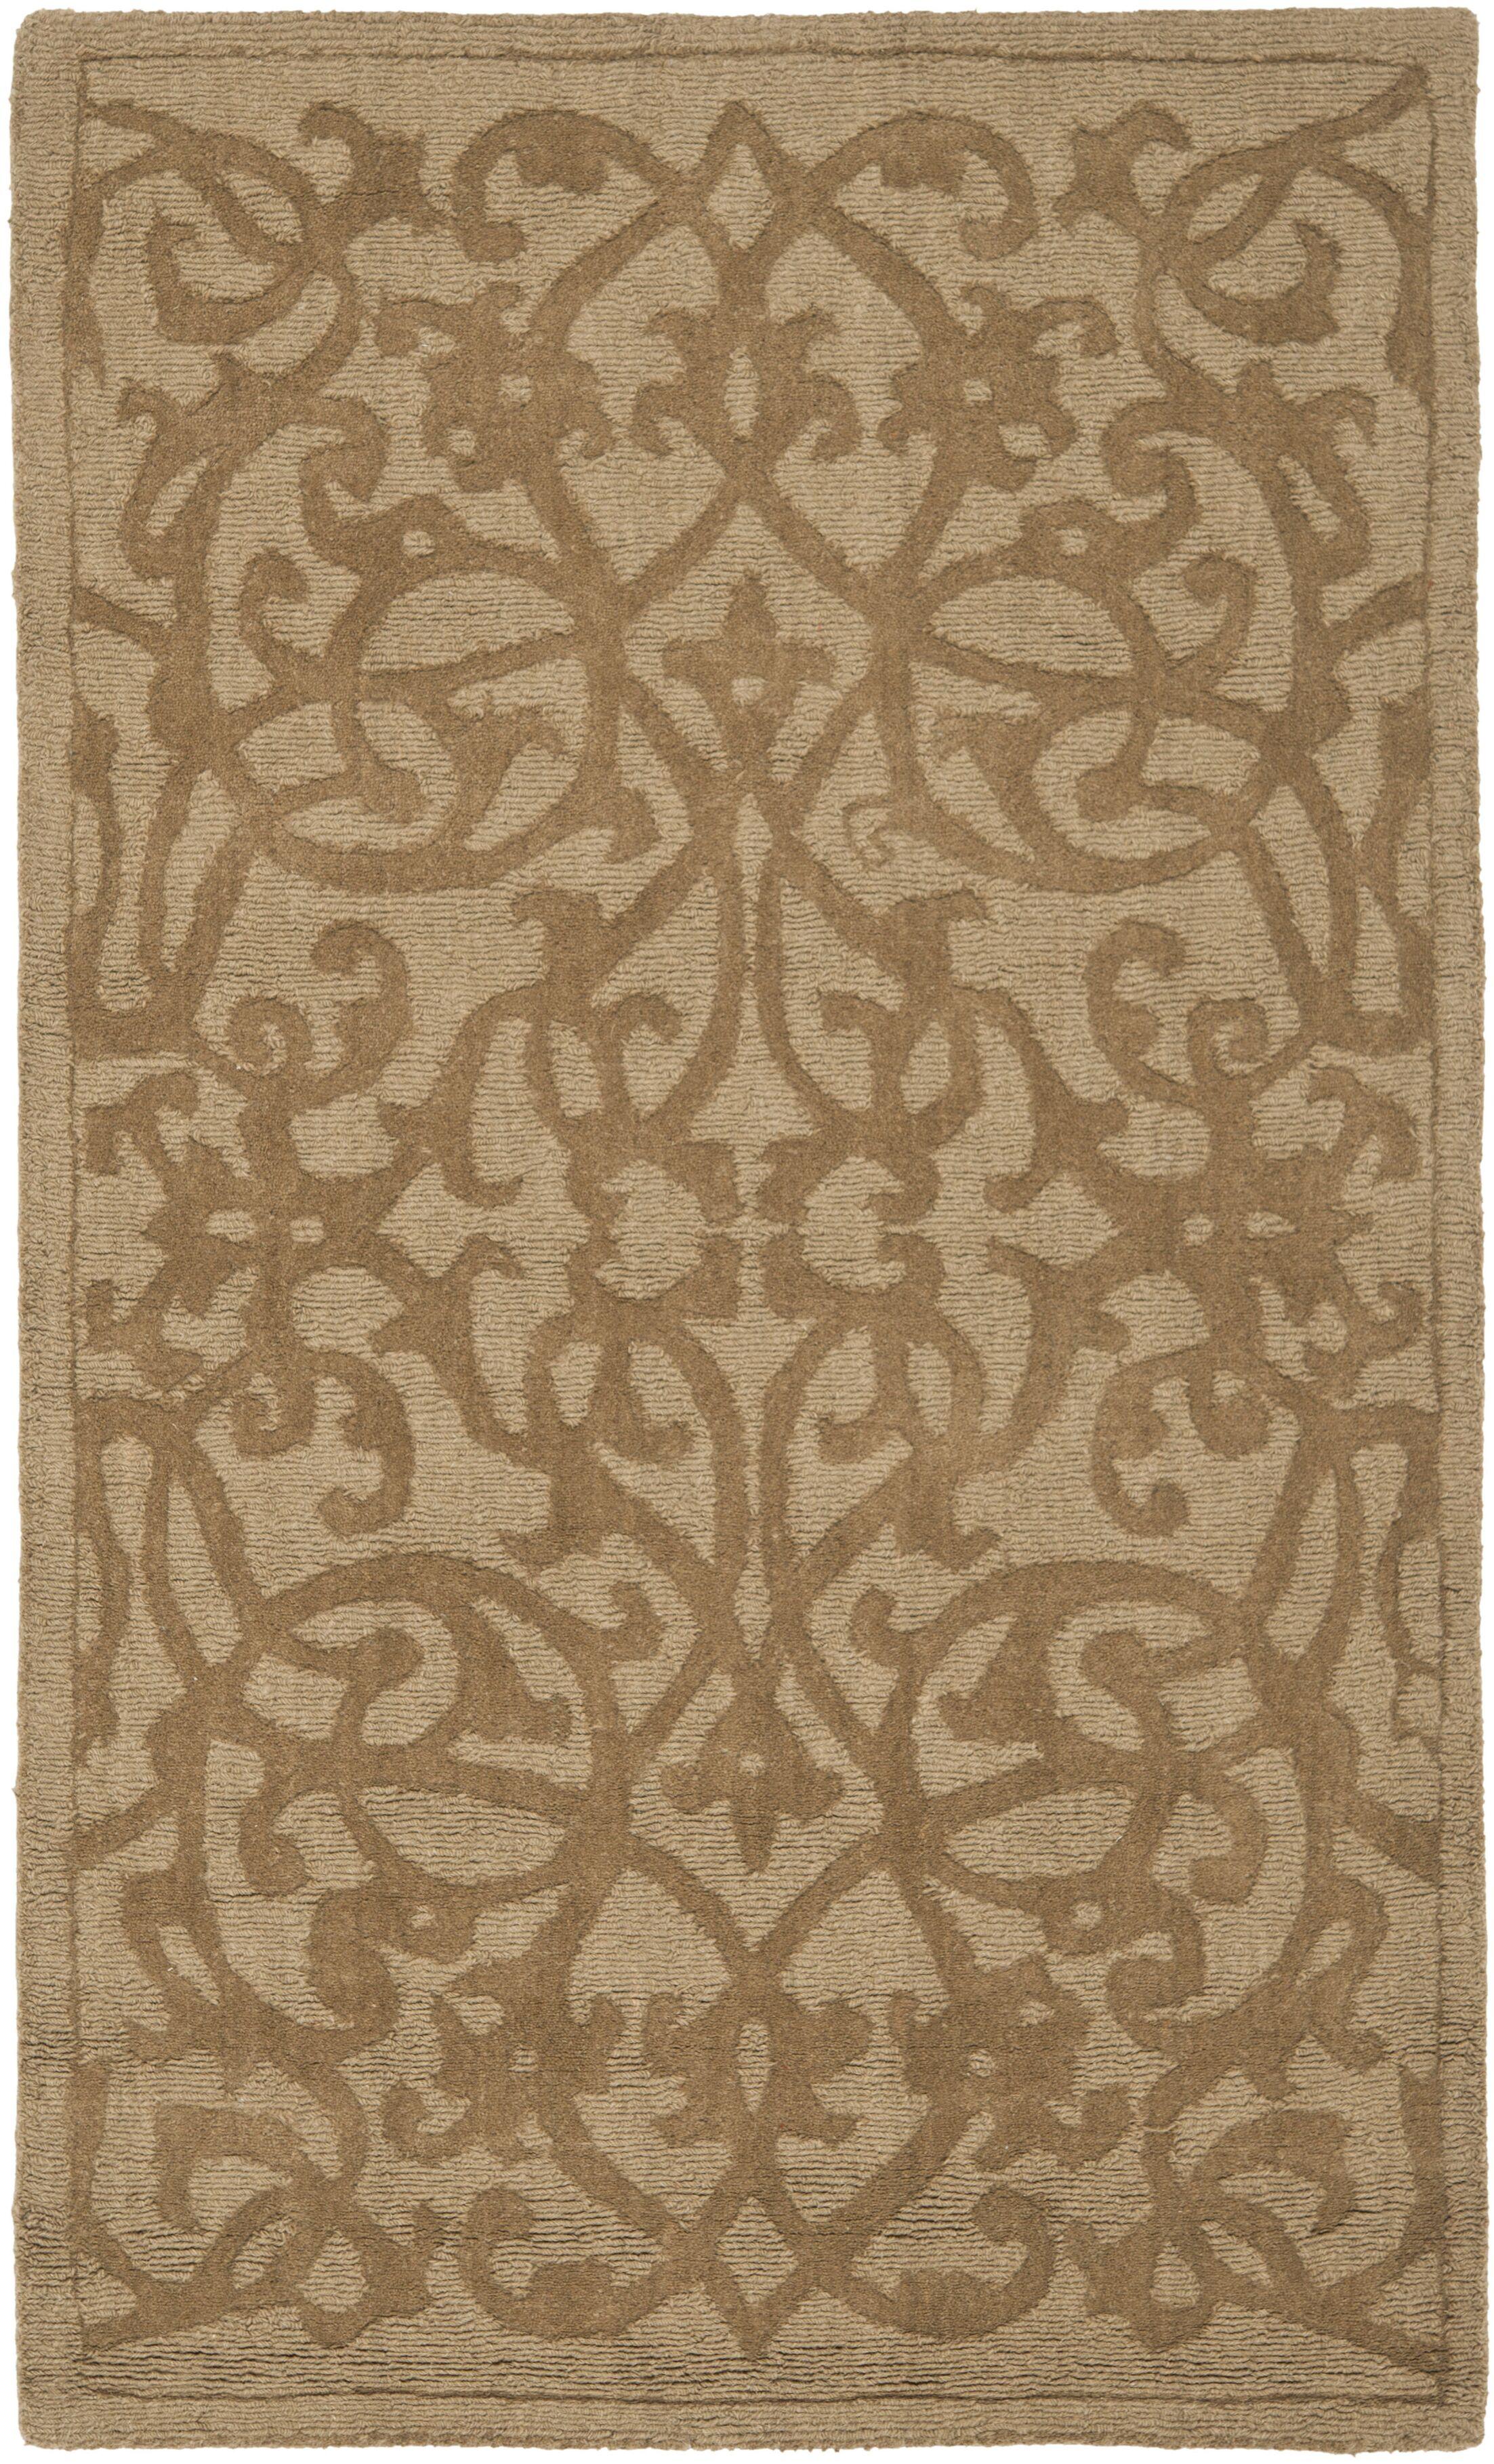 Palmwood Modern Light Brown Area Rug Rug Size: Rectangle 7'6